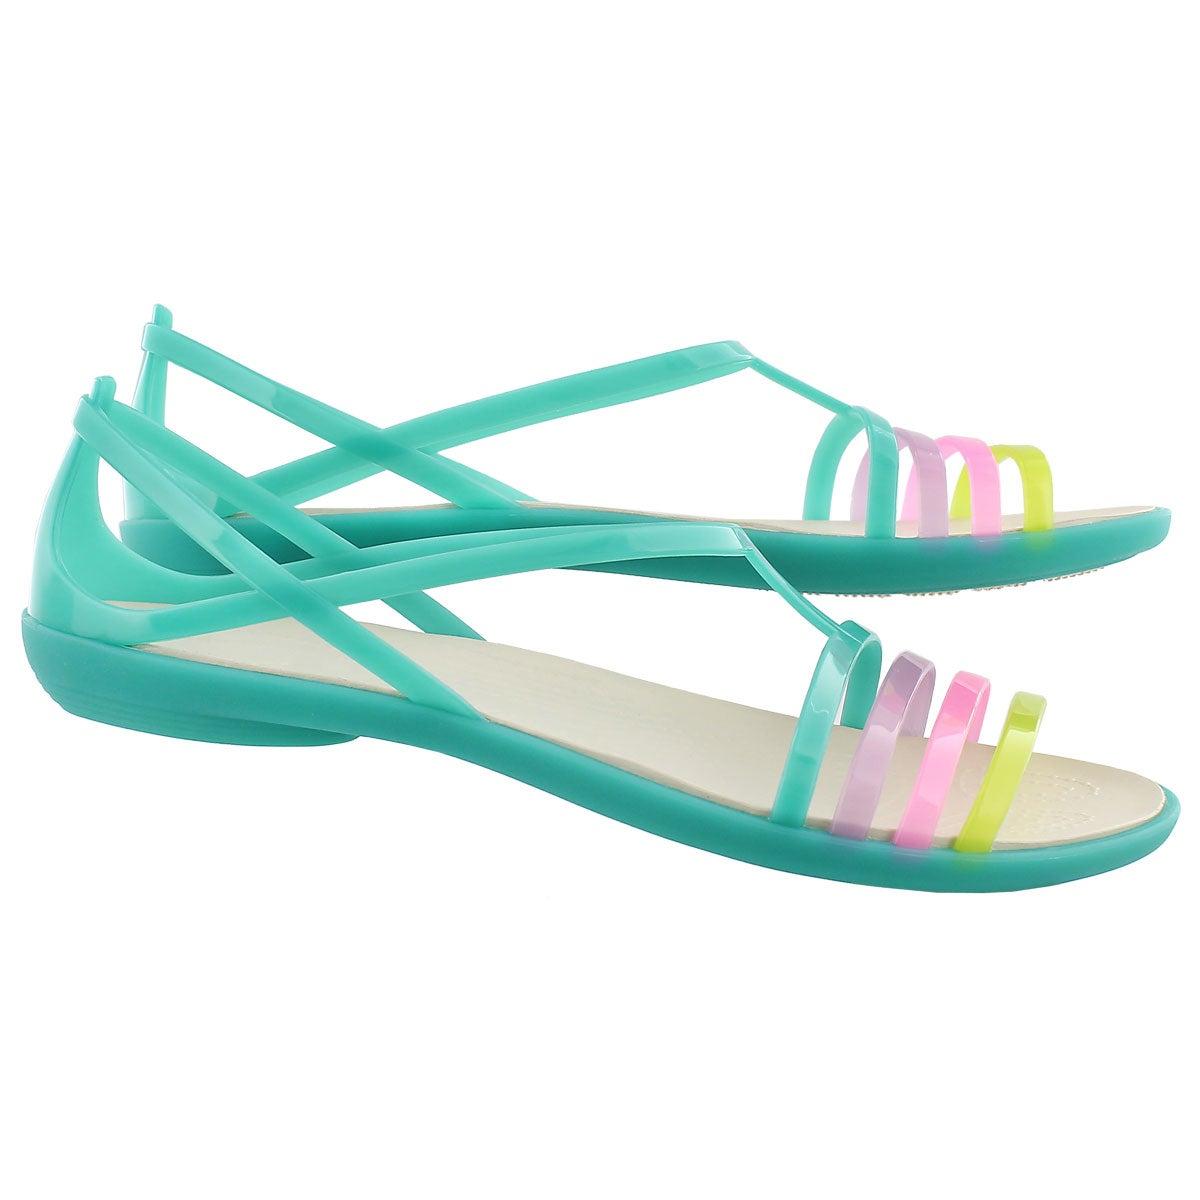 Lds Isabella green sandal